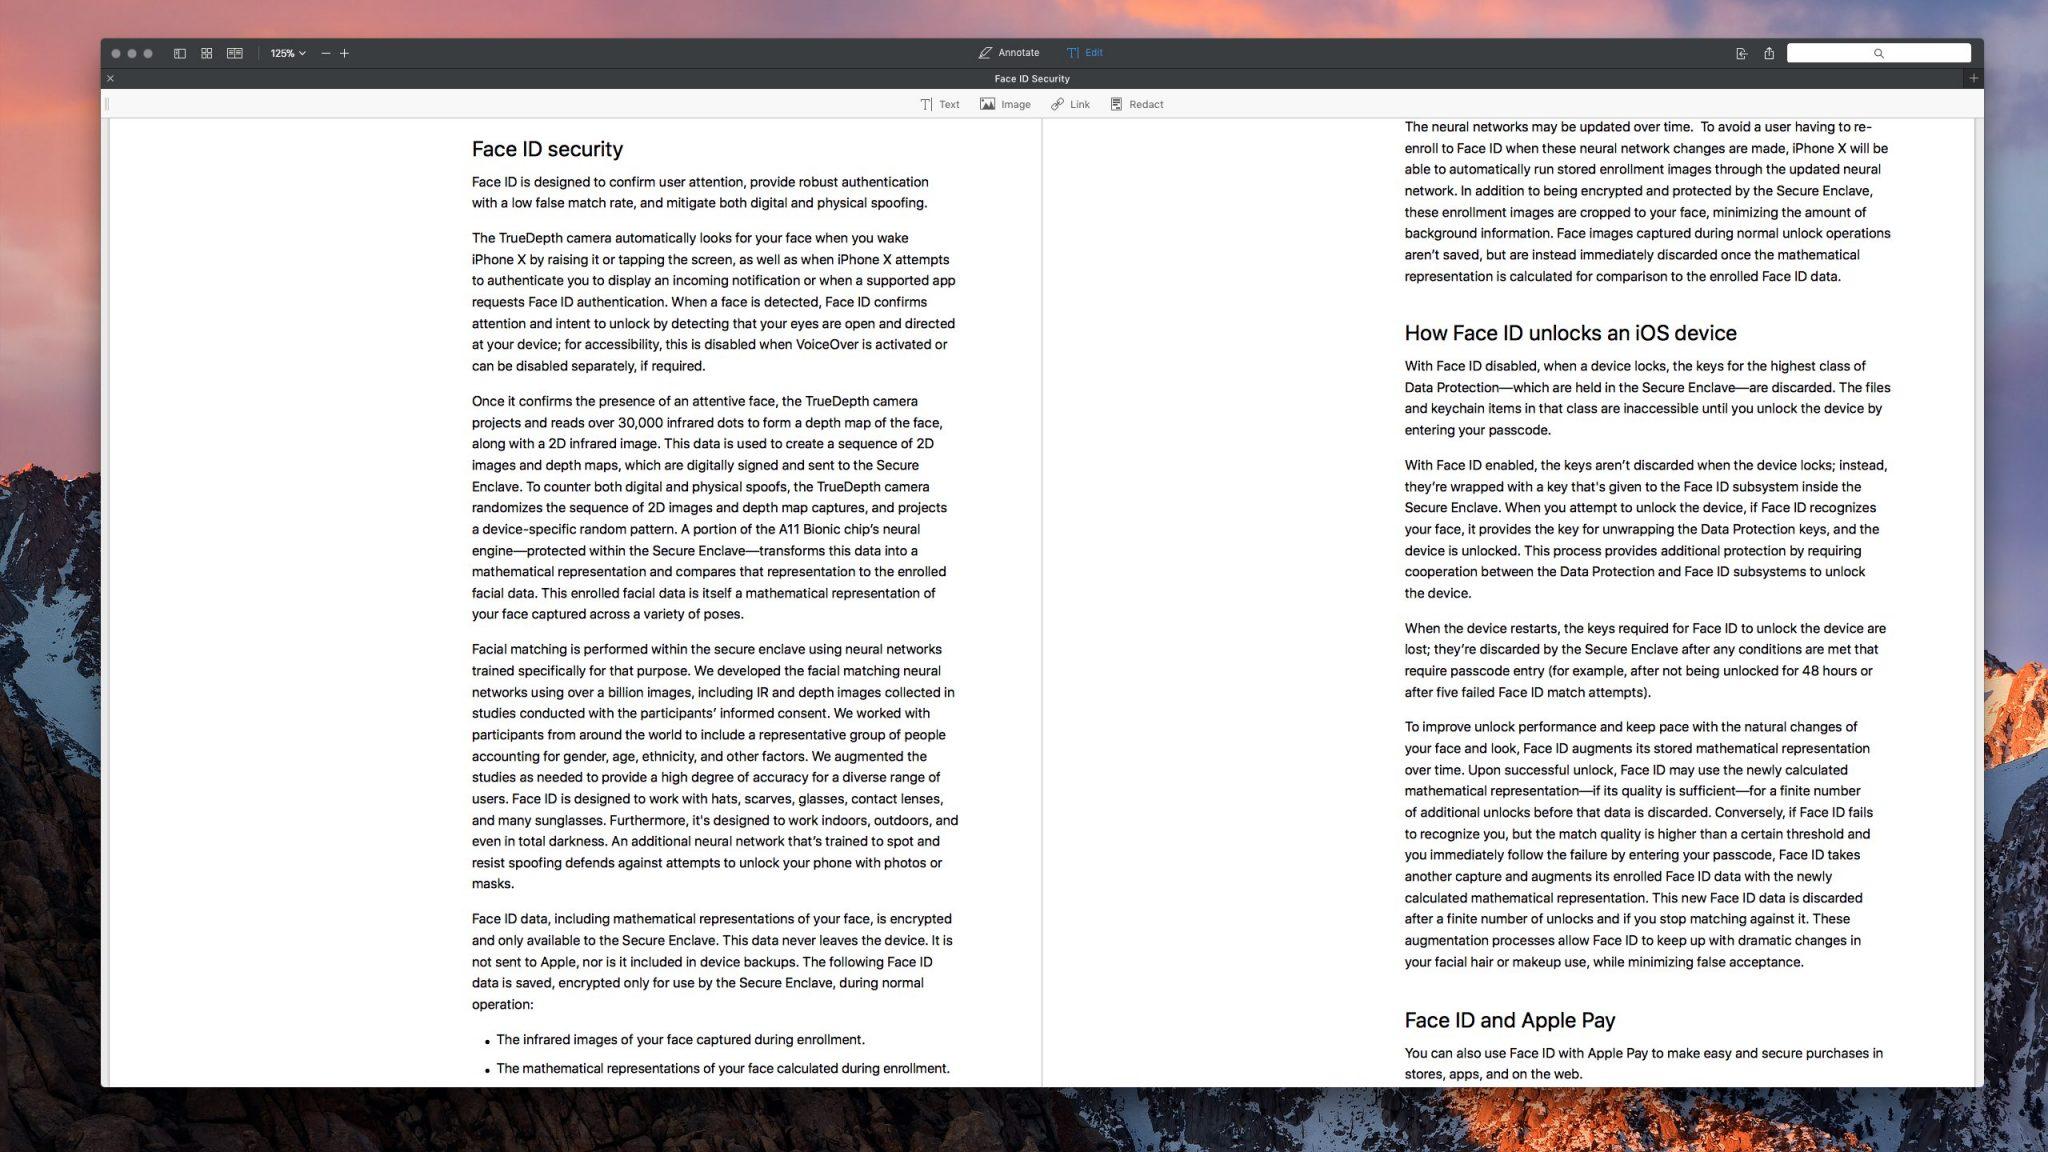 Apple снизила объем заказов деталей для iPhone X